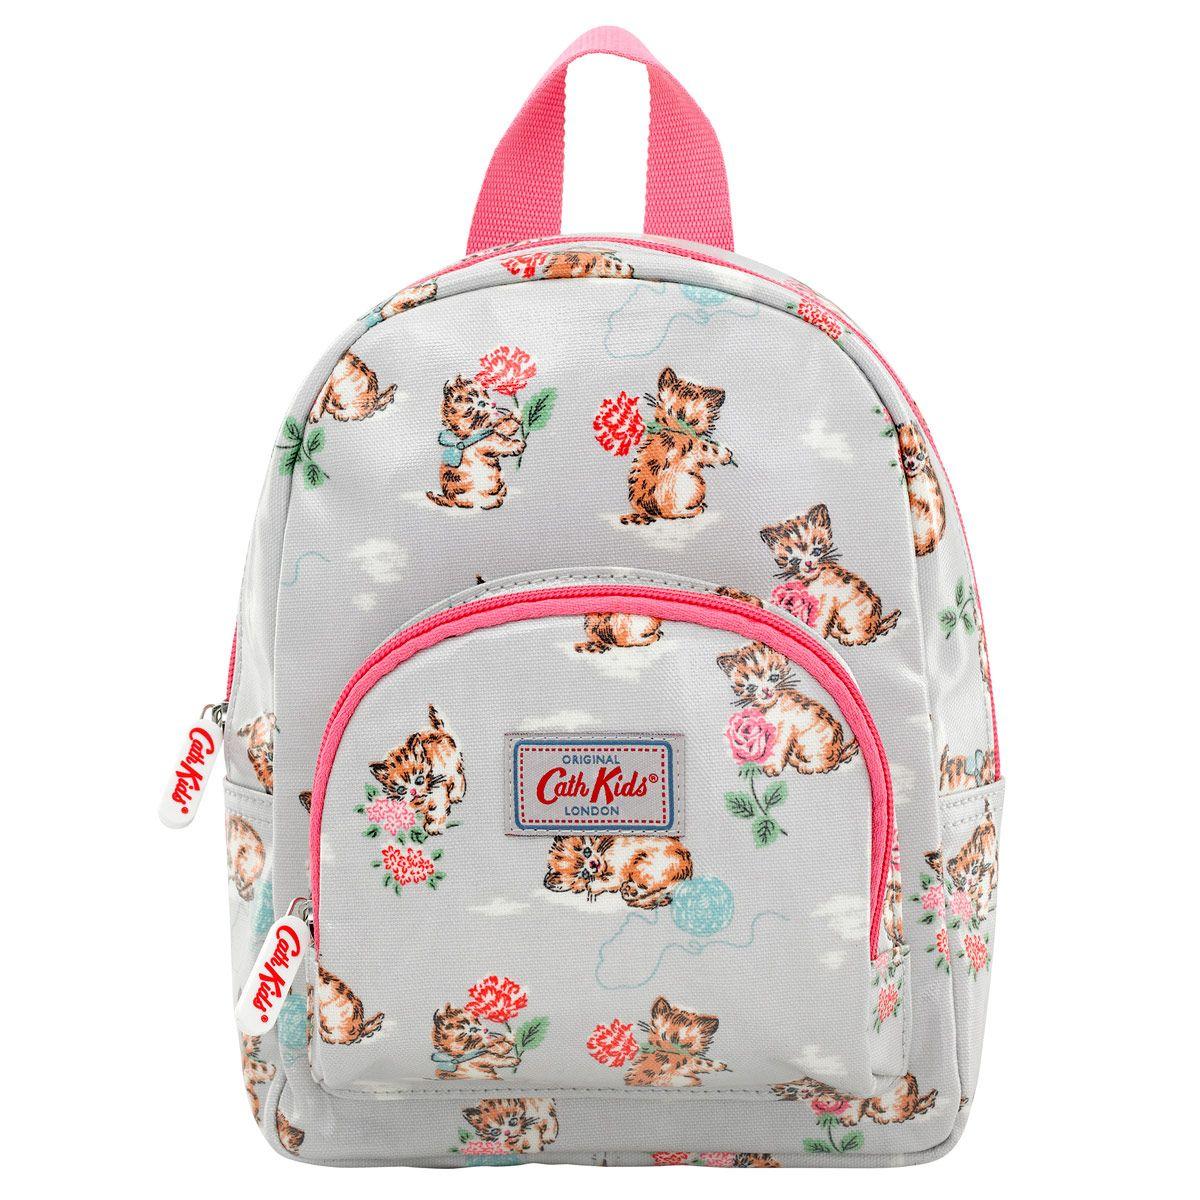 Kittens Kids Mini Rucksack Cath Kidston I Need This For Abbie